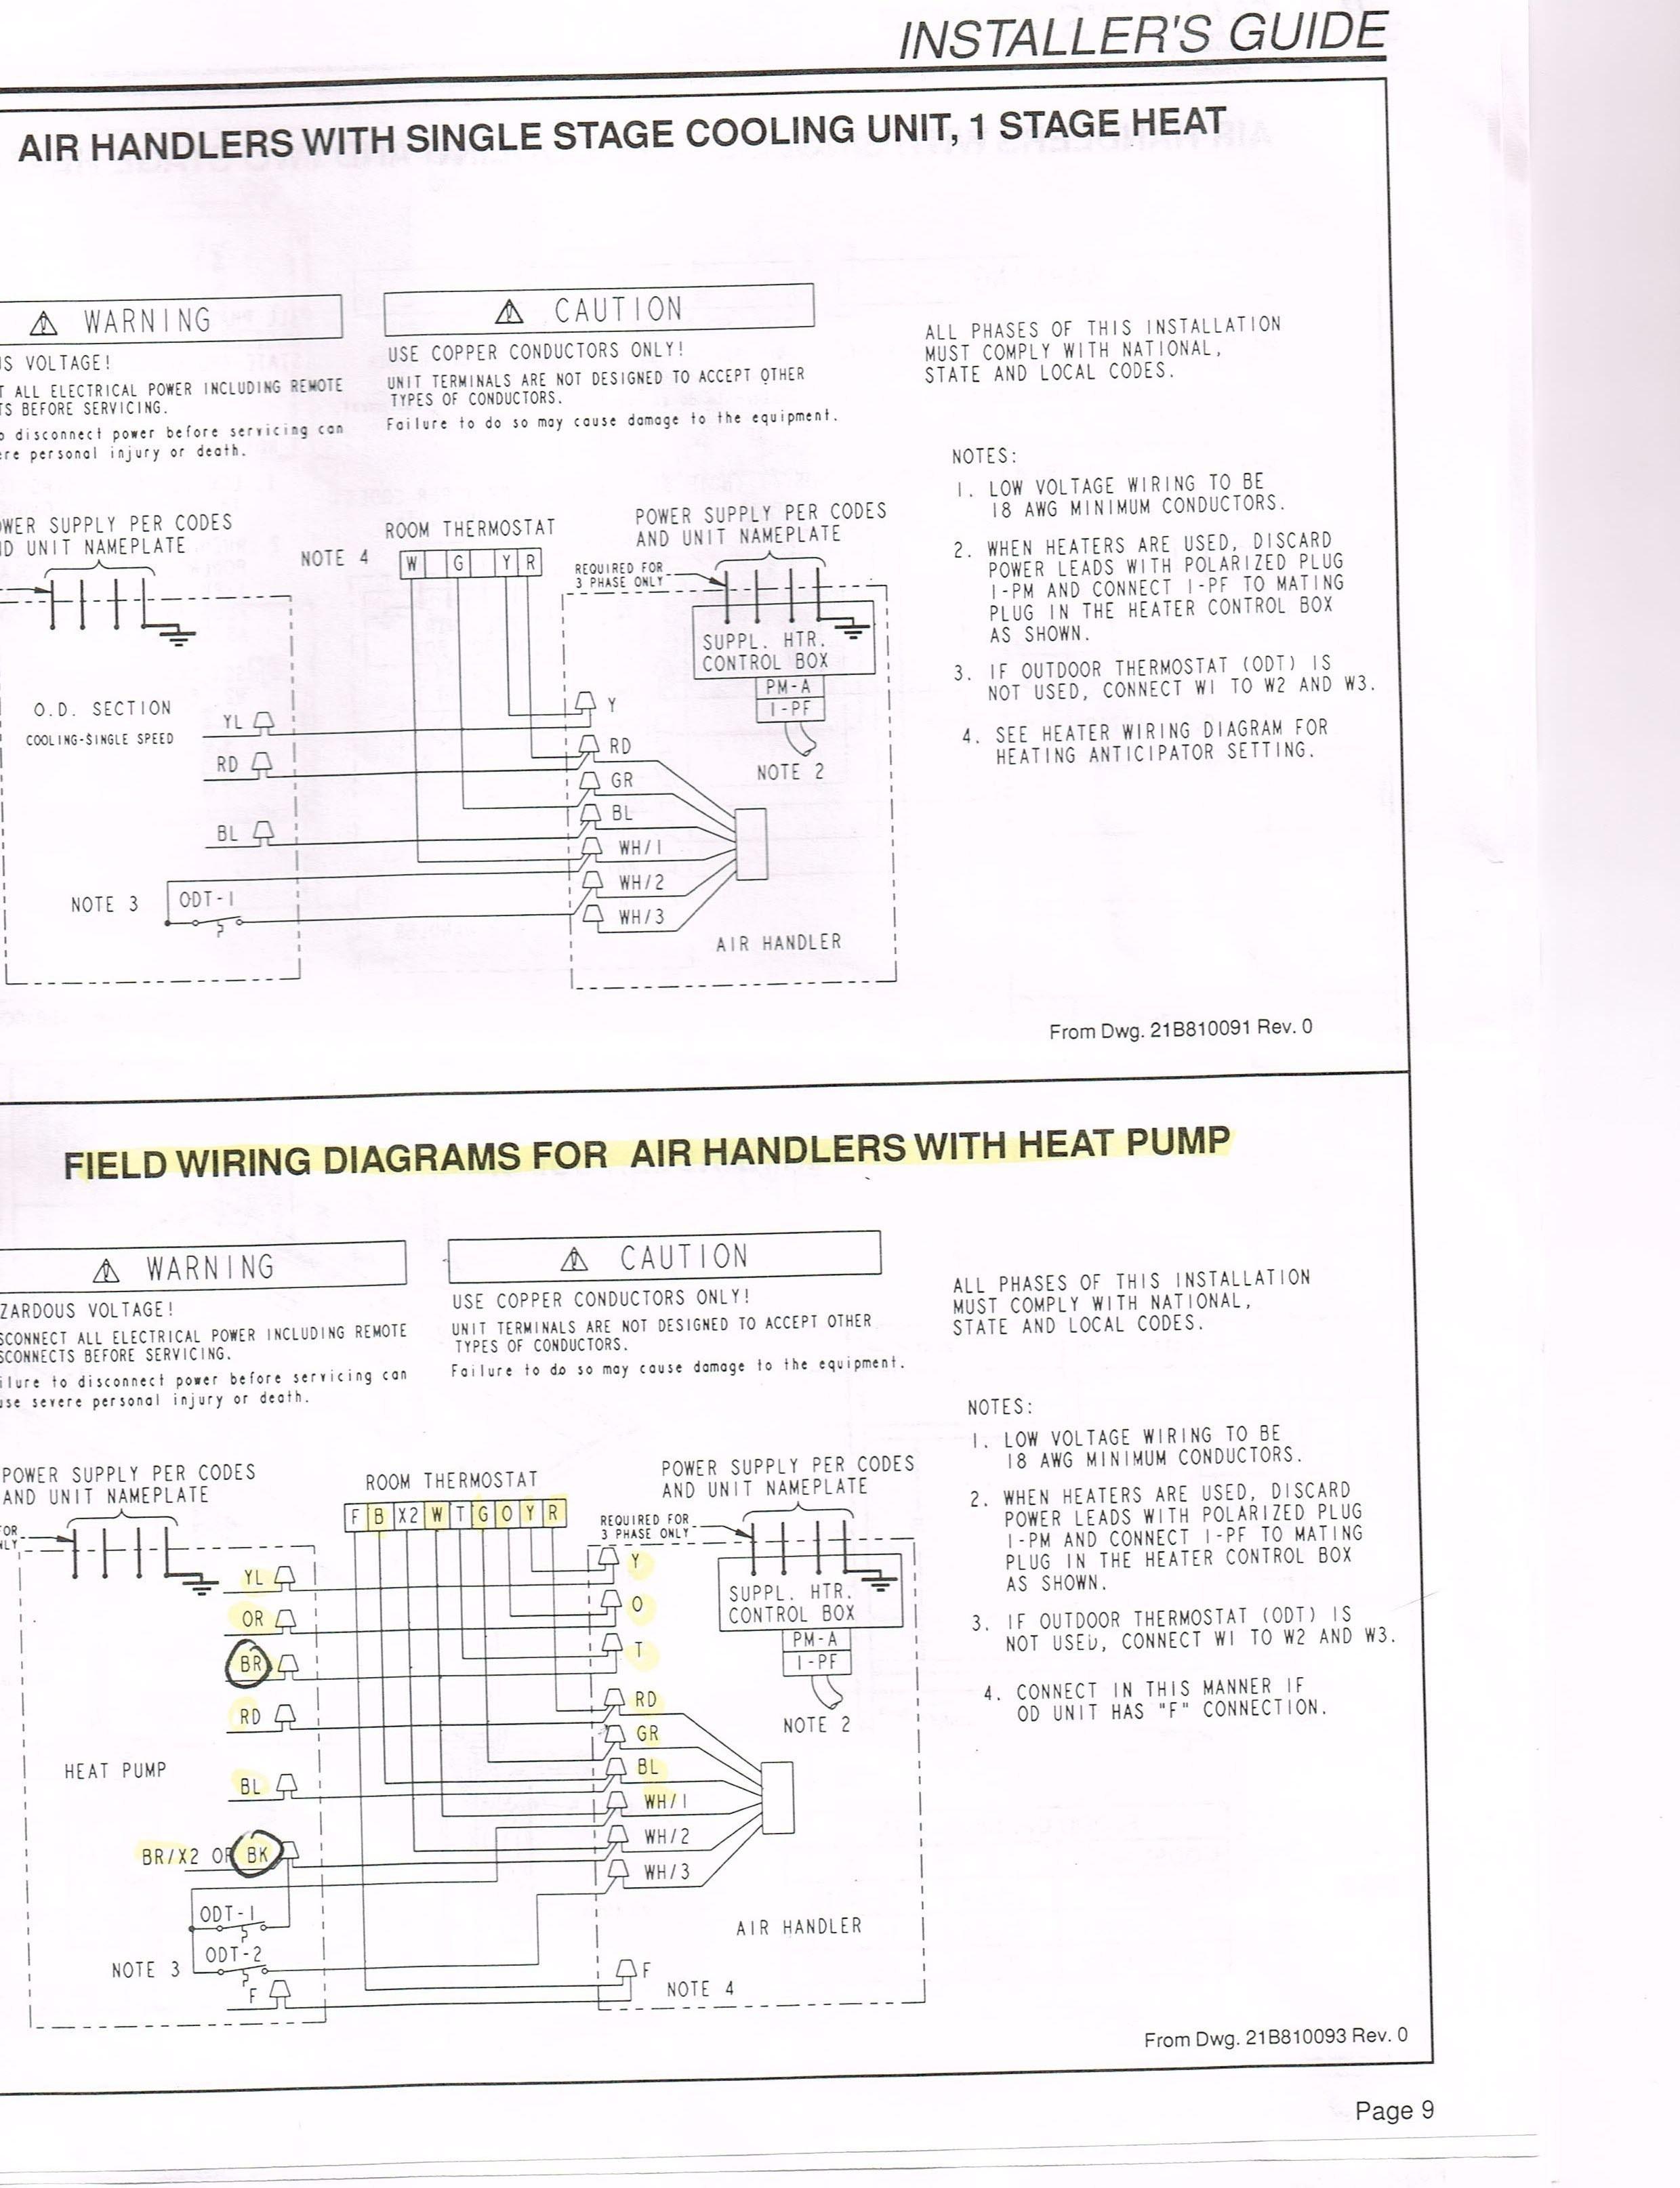 Ford 7 3 Engine Diagram Wiring Diagram Glow Plug Relay 7 3 Free Downloads Luxury Glow Plug Of Ford 7 3 Engine Diagram